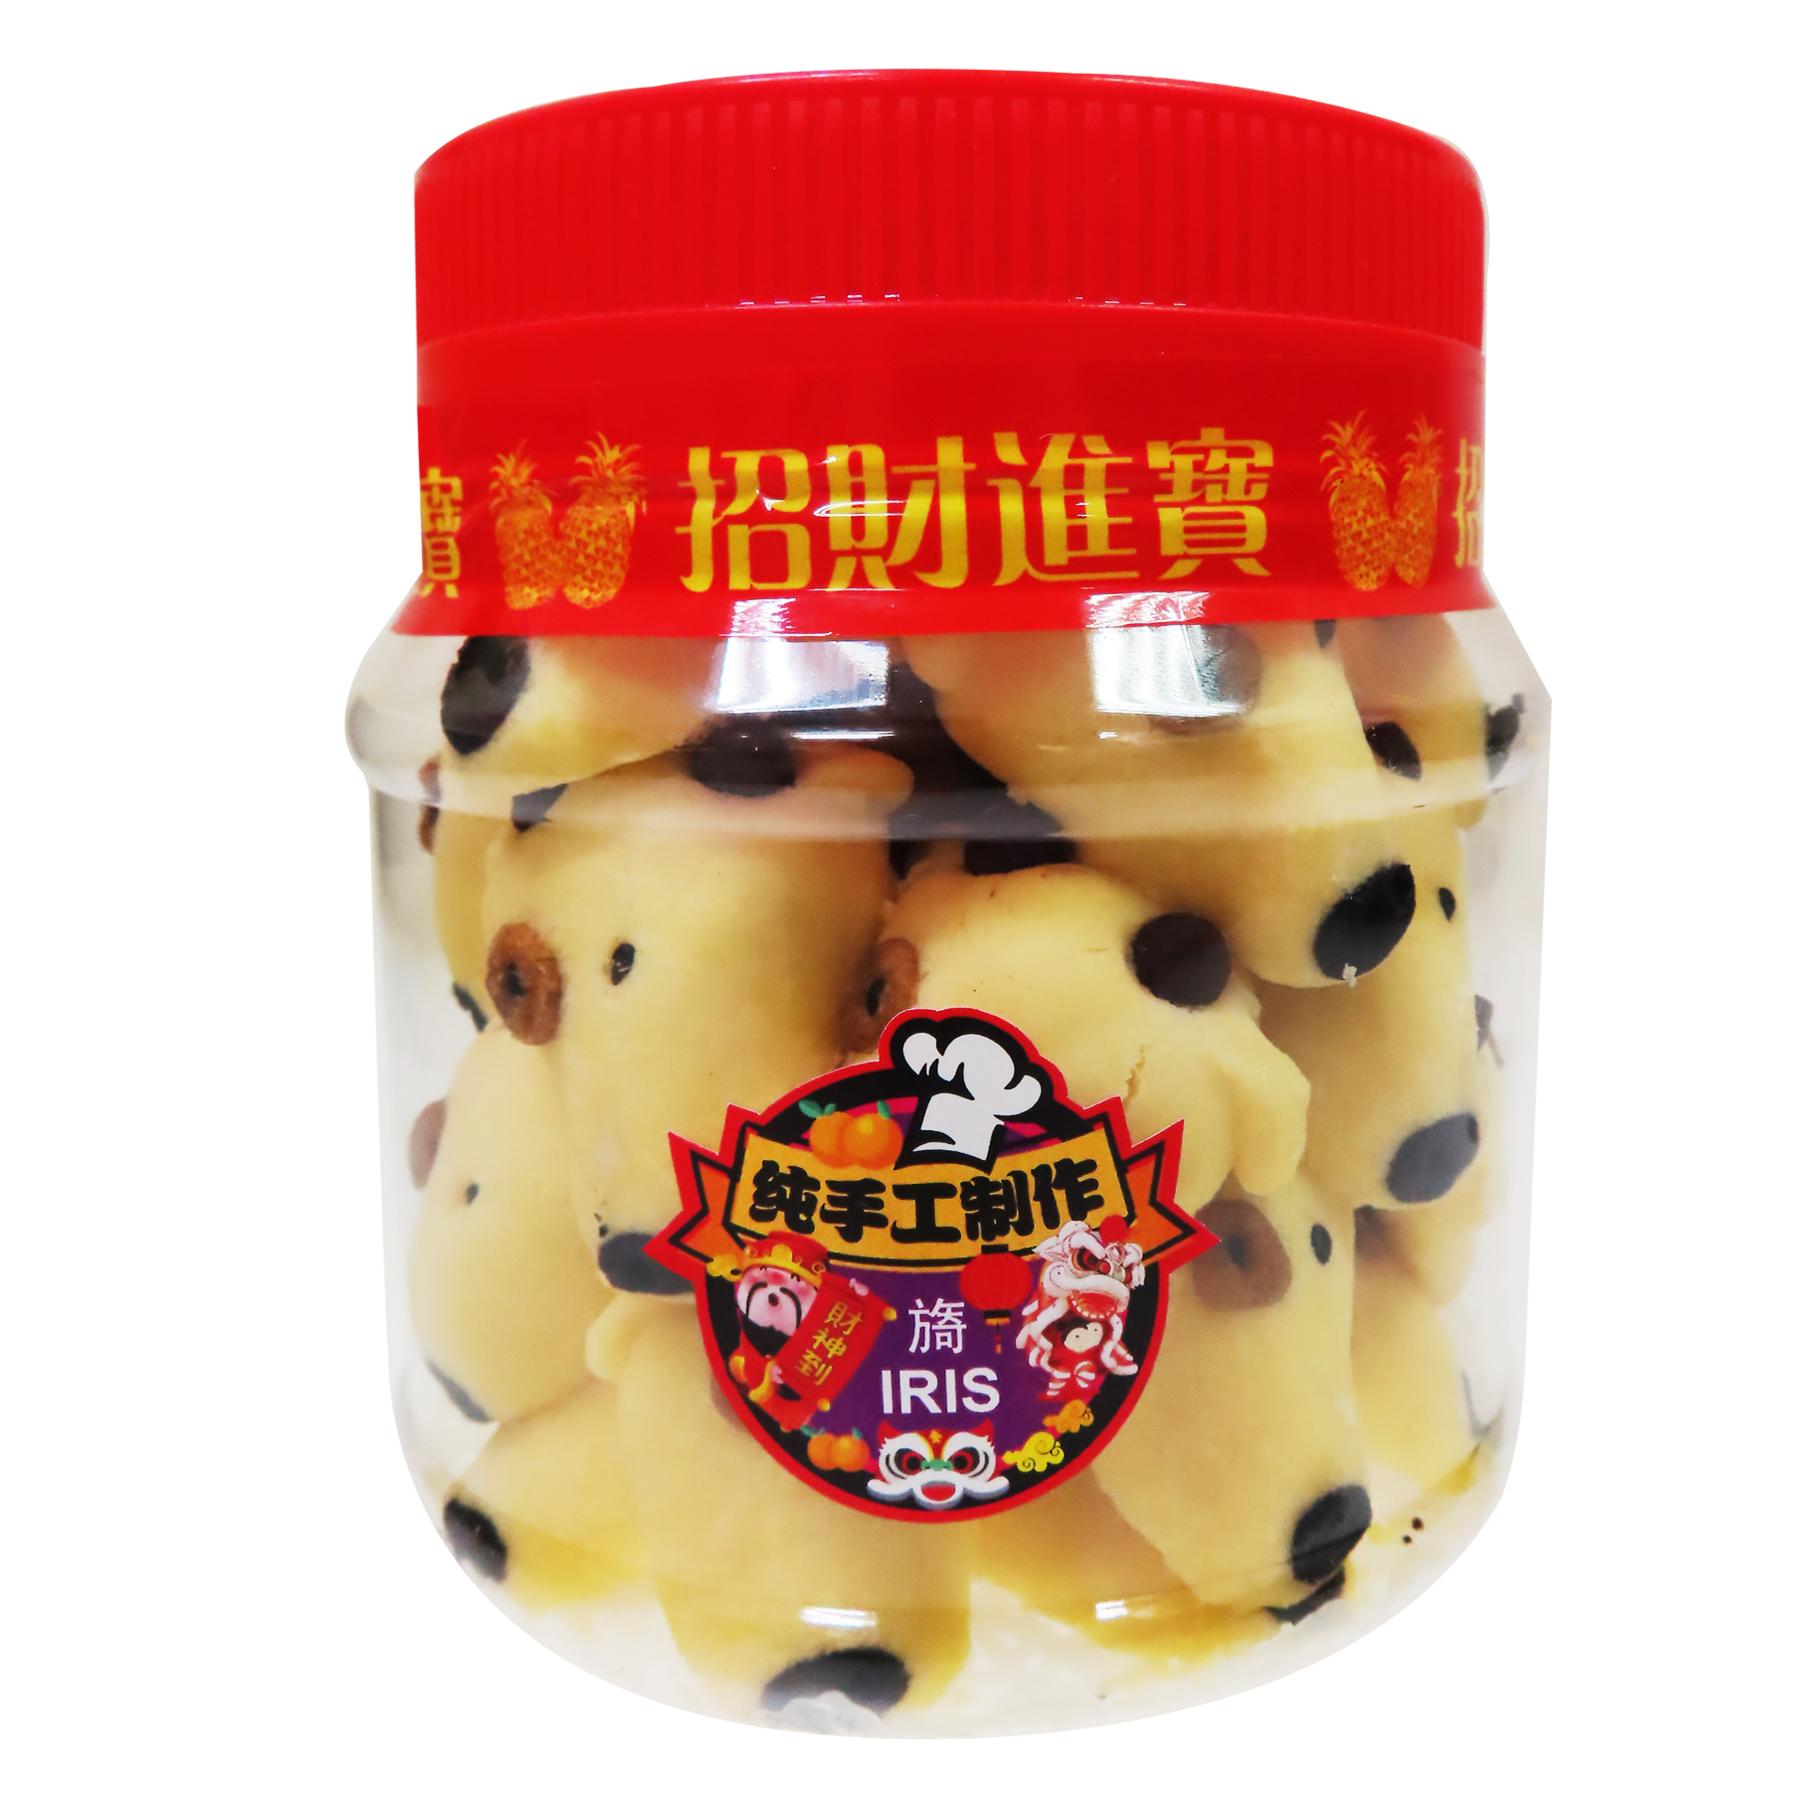 Image CNY Homemade Cookies 纯手工牛饼(十二生肖)380g